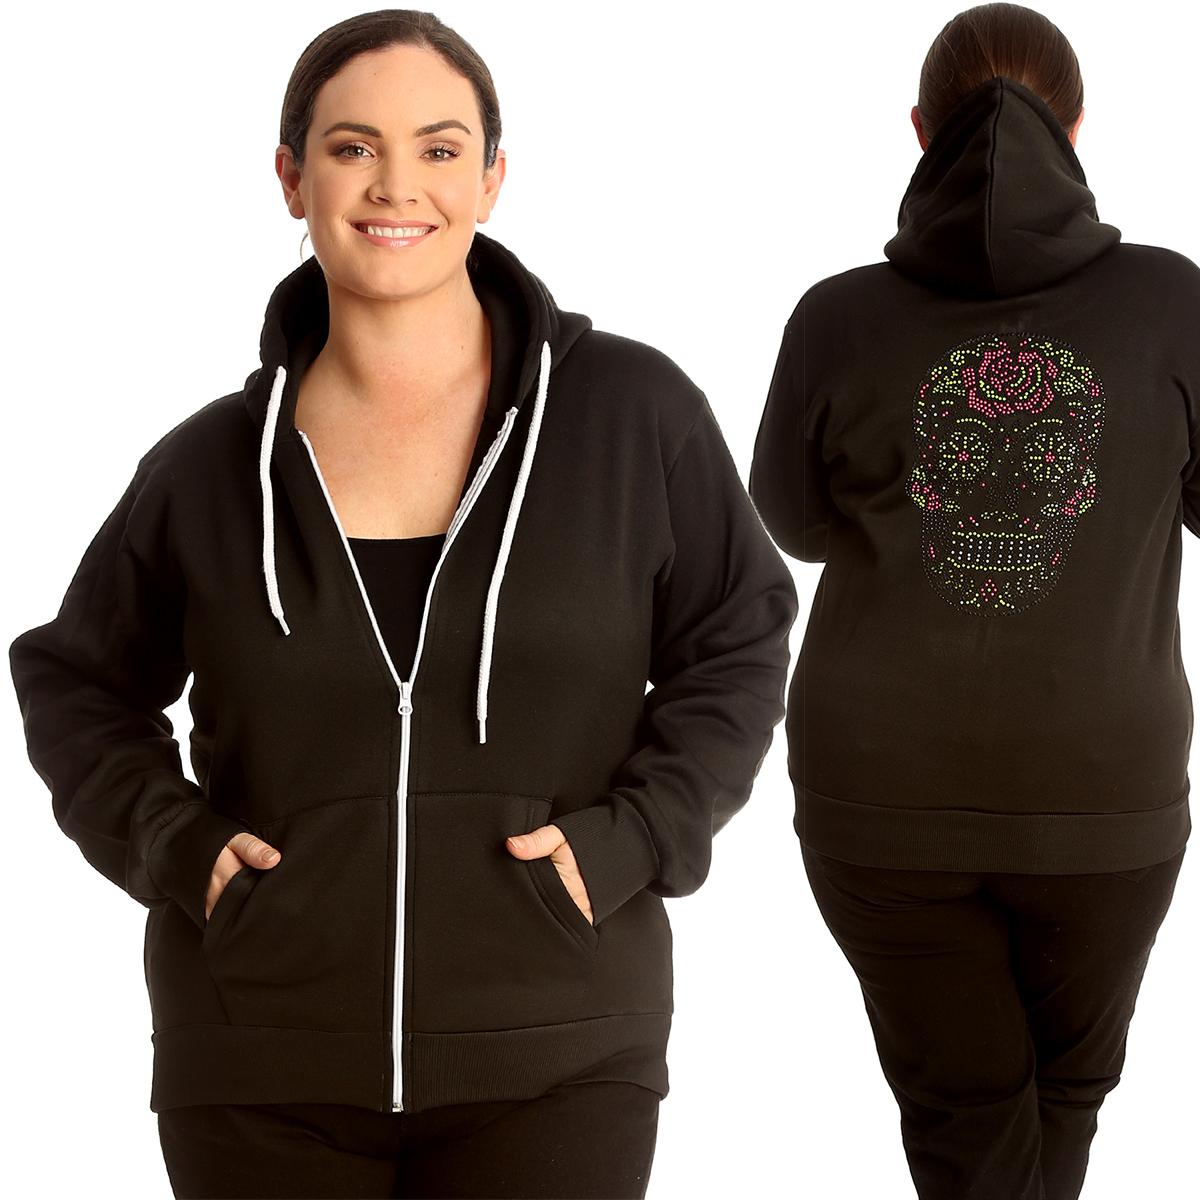 Women Ladies Warm Hoodies Fleece Coat Outerwear Hooded Sweatshirt Top Plus Size